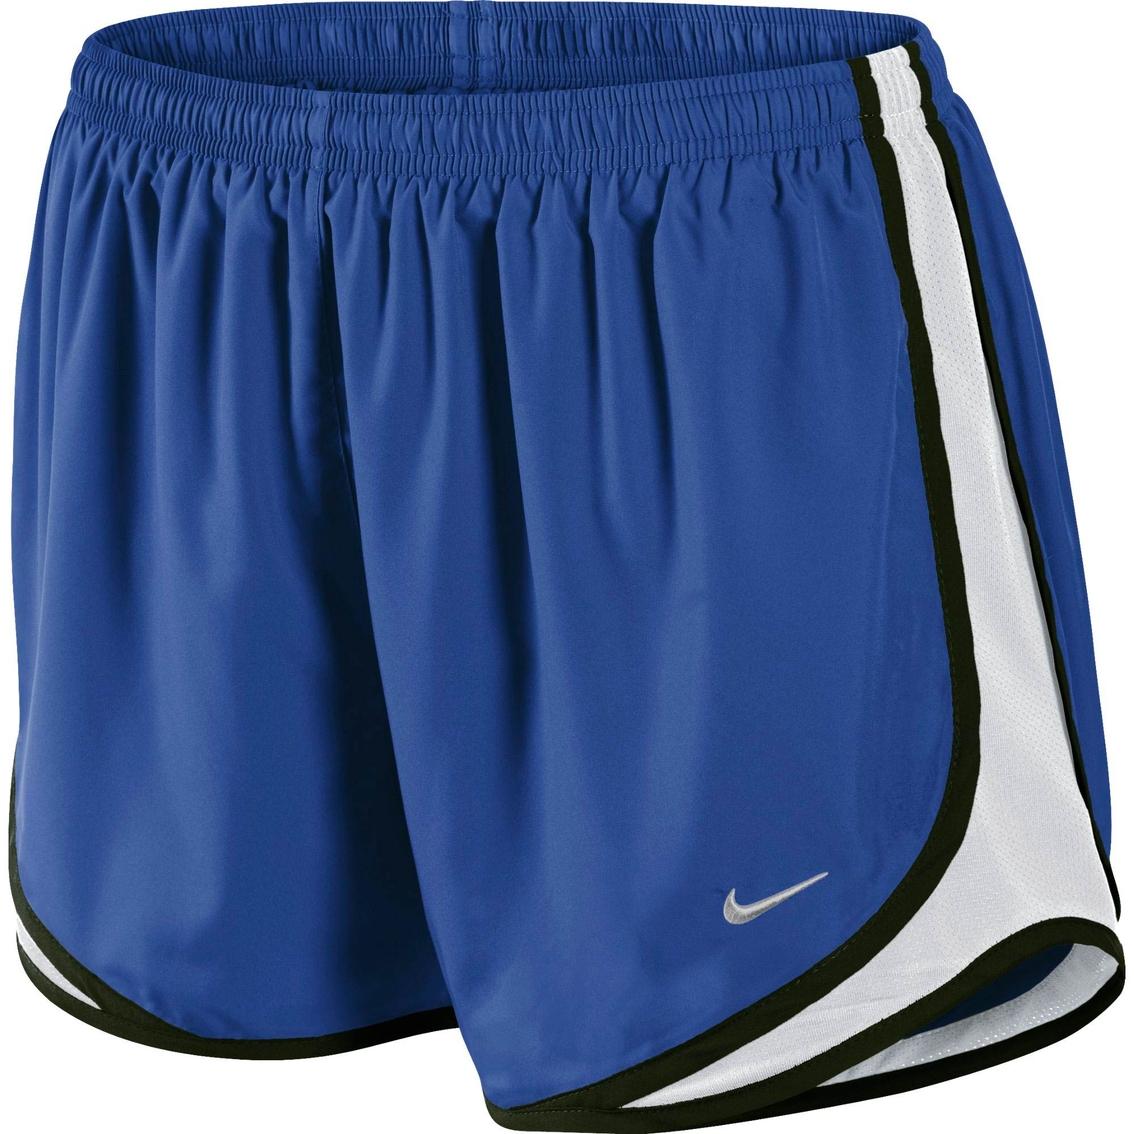 nike tempo track running shorts shorts apparel shop the exchange. Black Bedroom Furniture Sets. Home Design Ideas